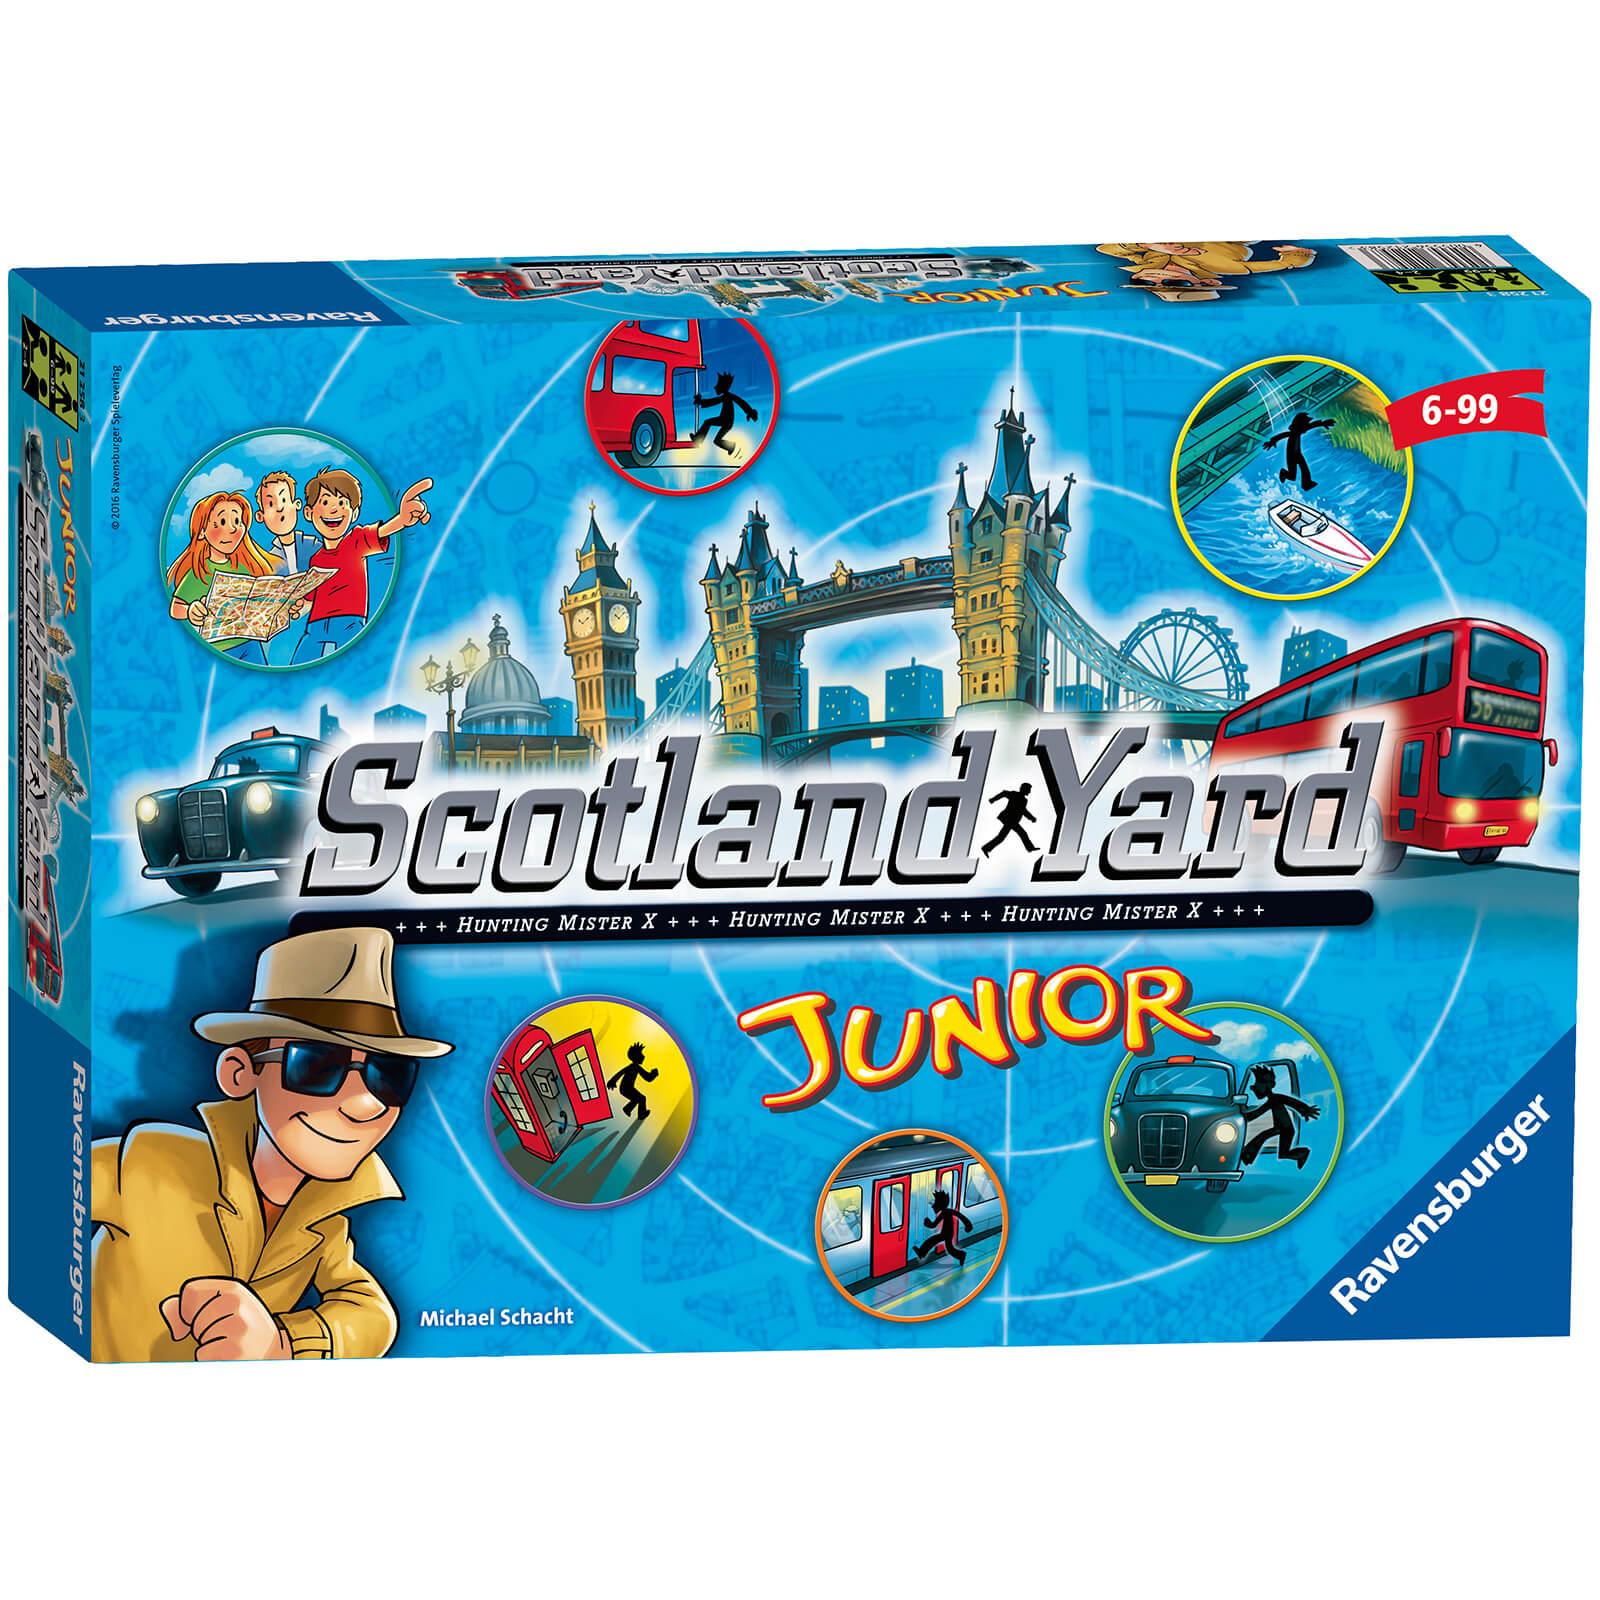 Ravensburger Scotland Yard Junior Family Strategy Game